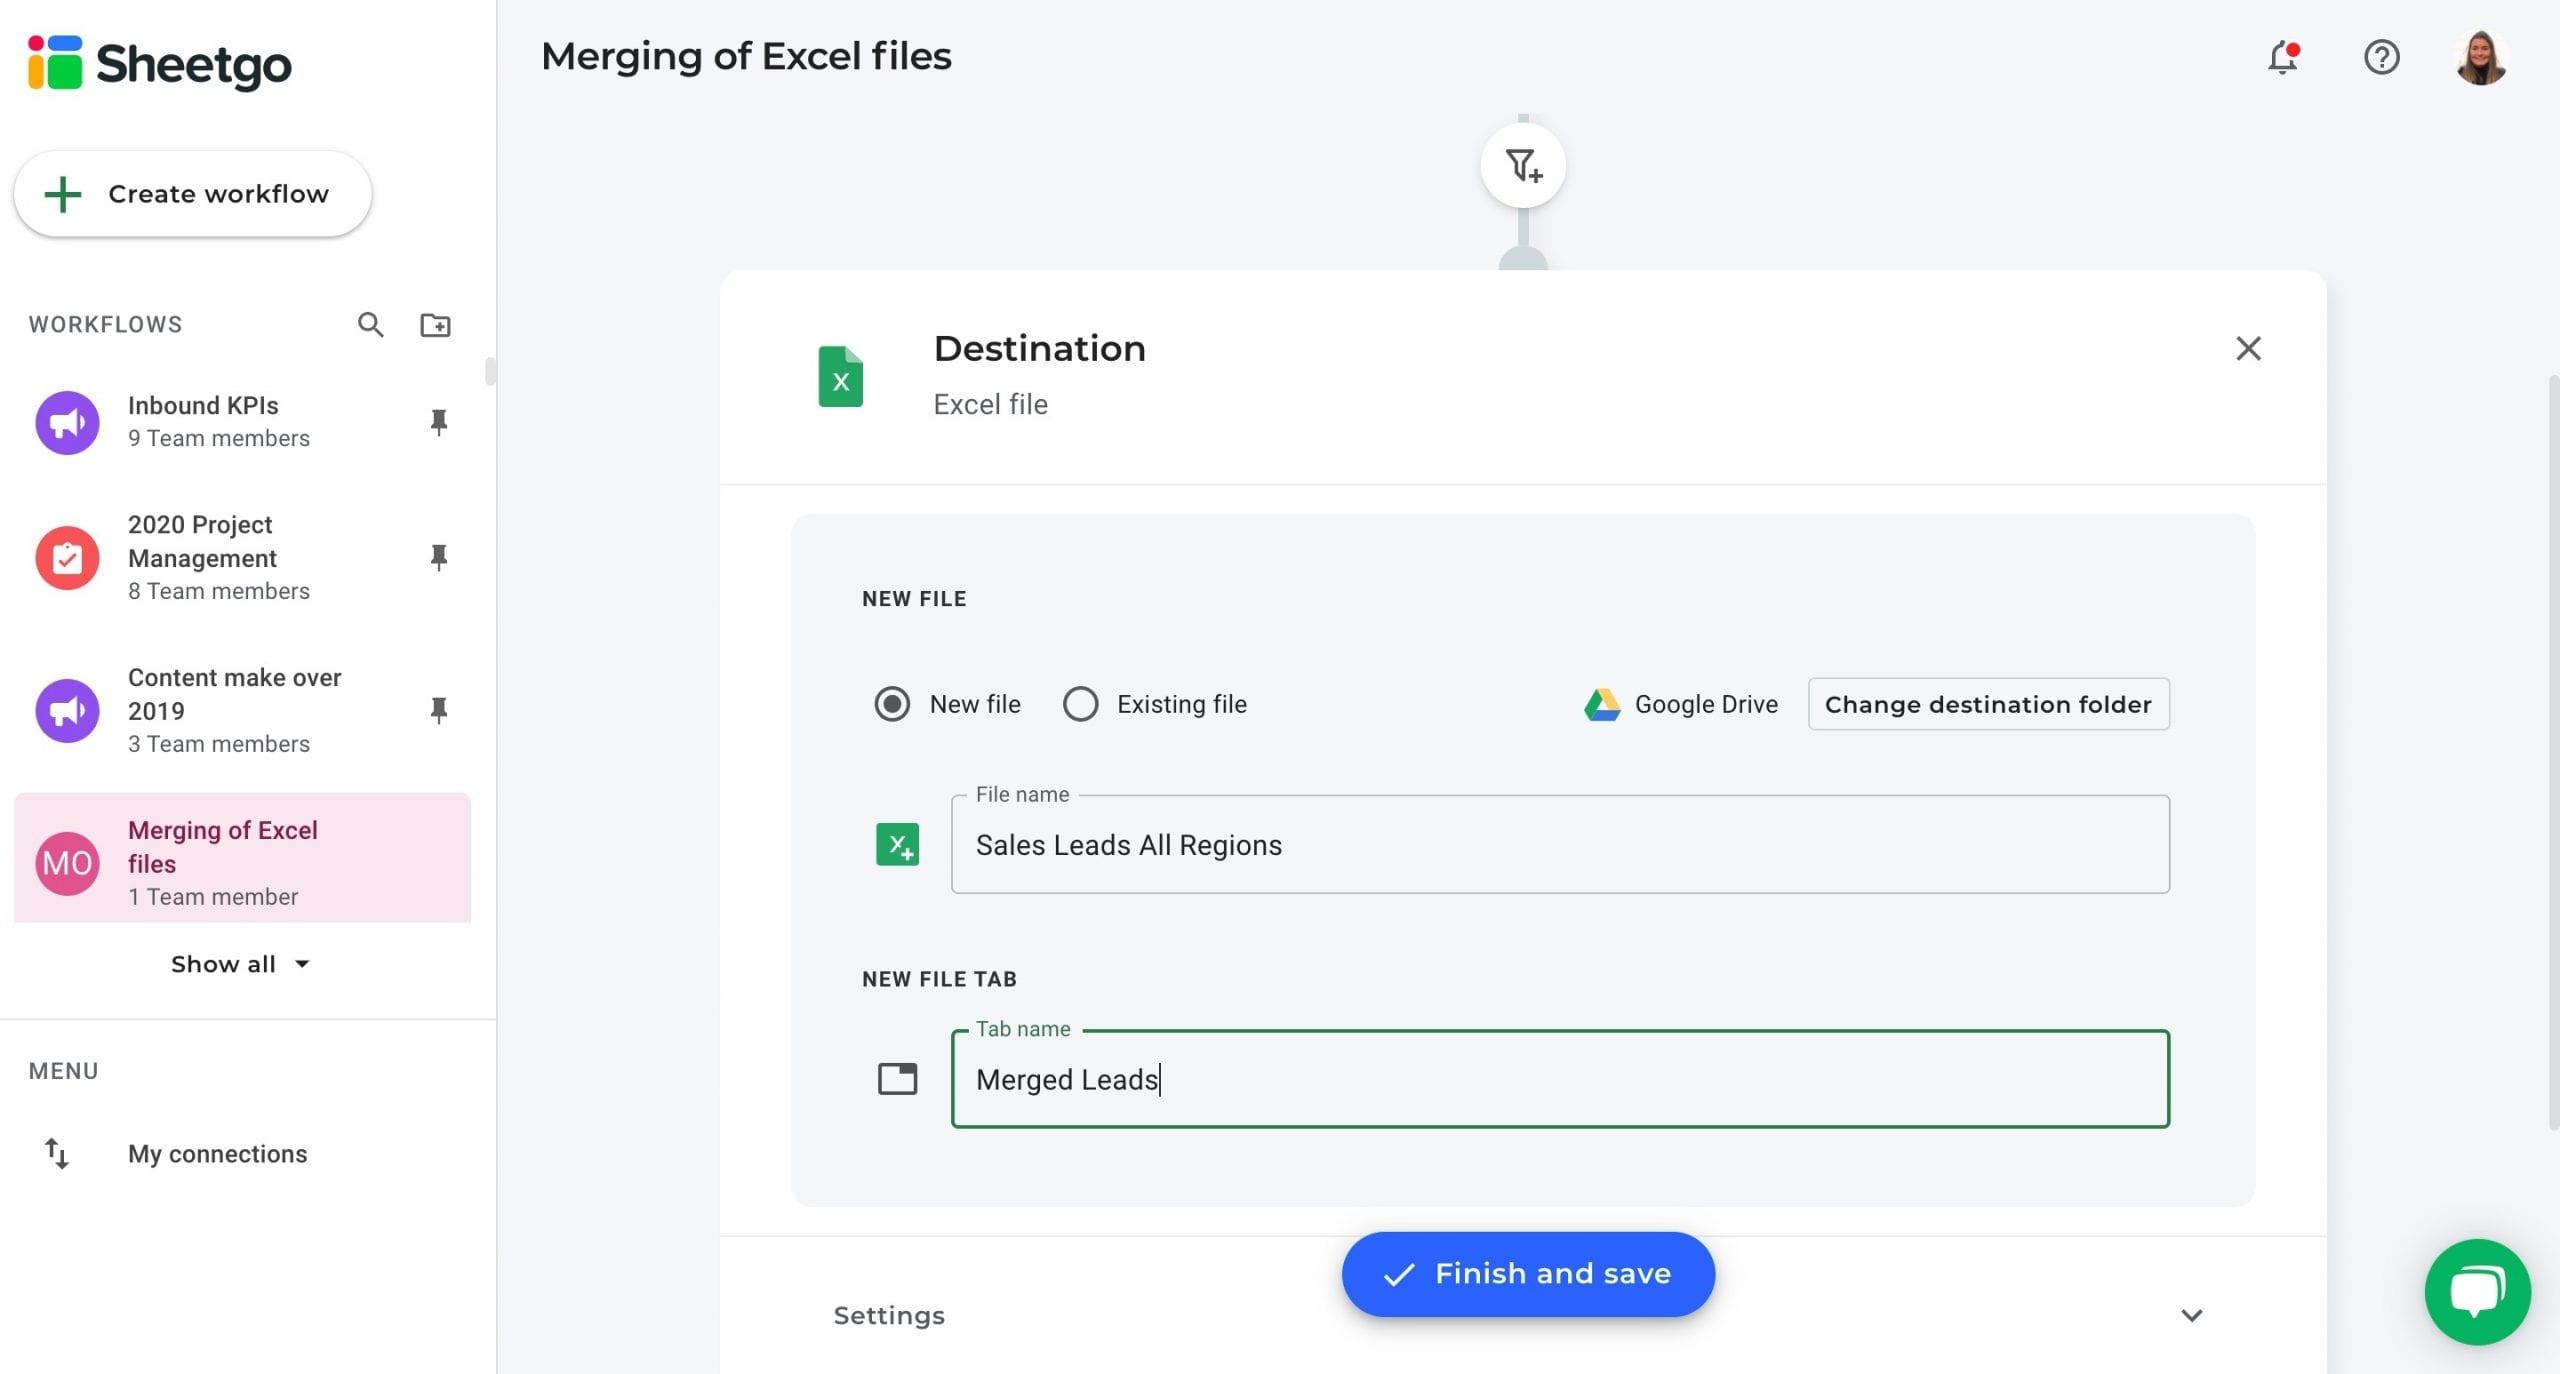 Merging of Excel files data destination